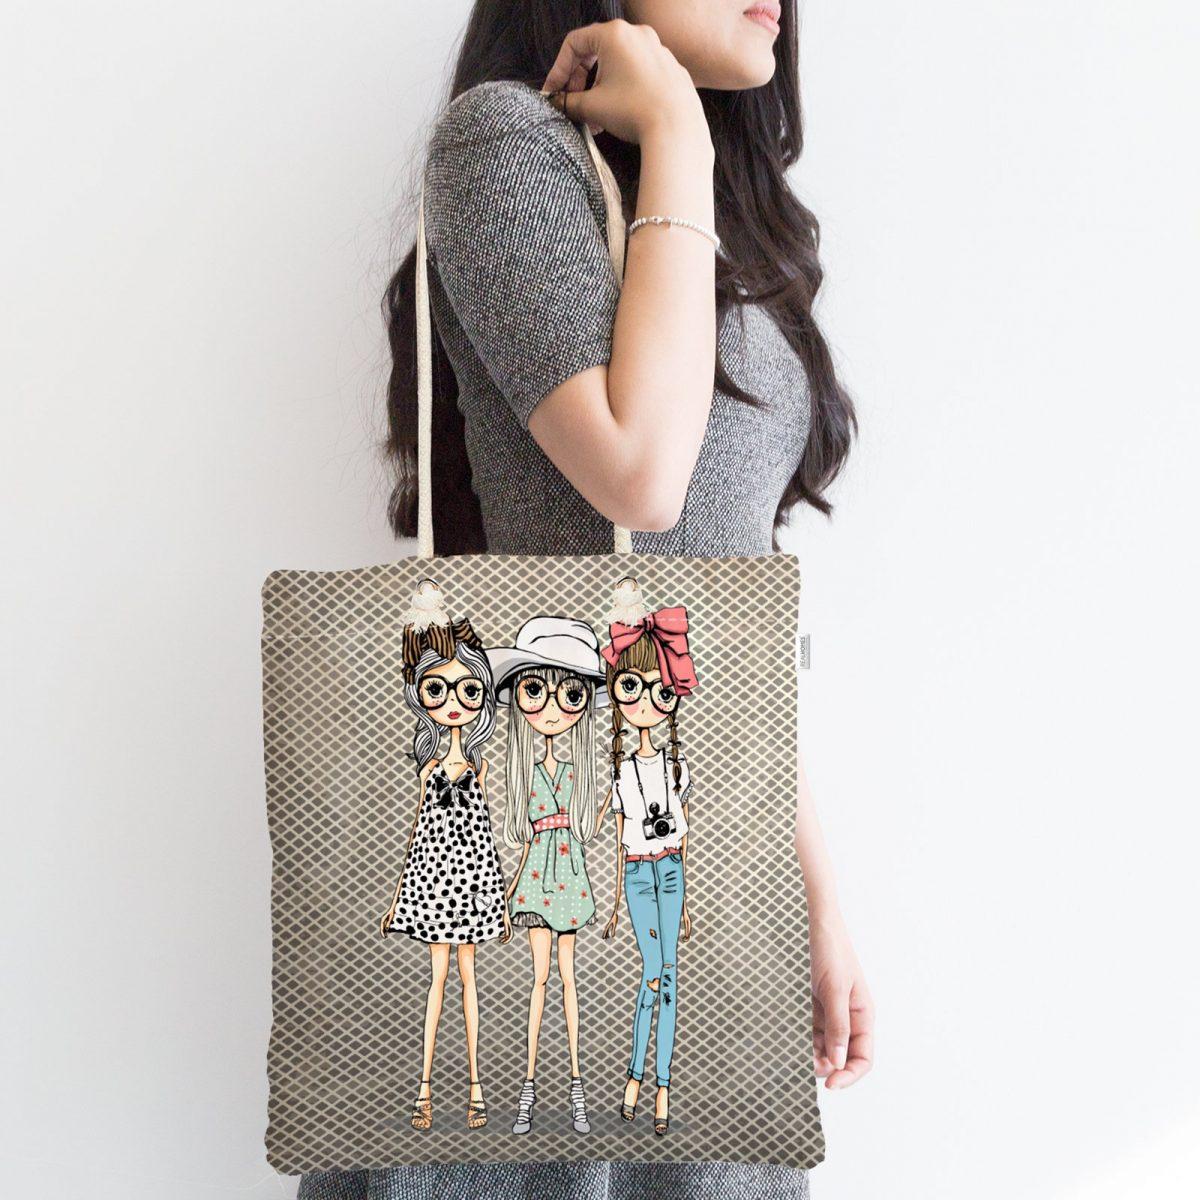 Fashion Girls Dijital Baskılı Modern Fermuarlı Kumaş Çanta Realhomes